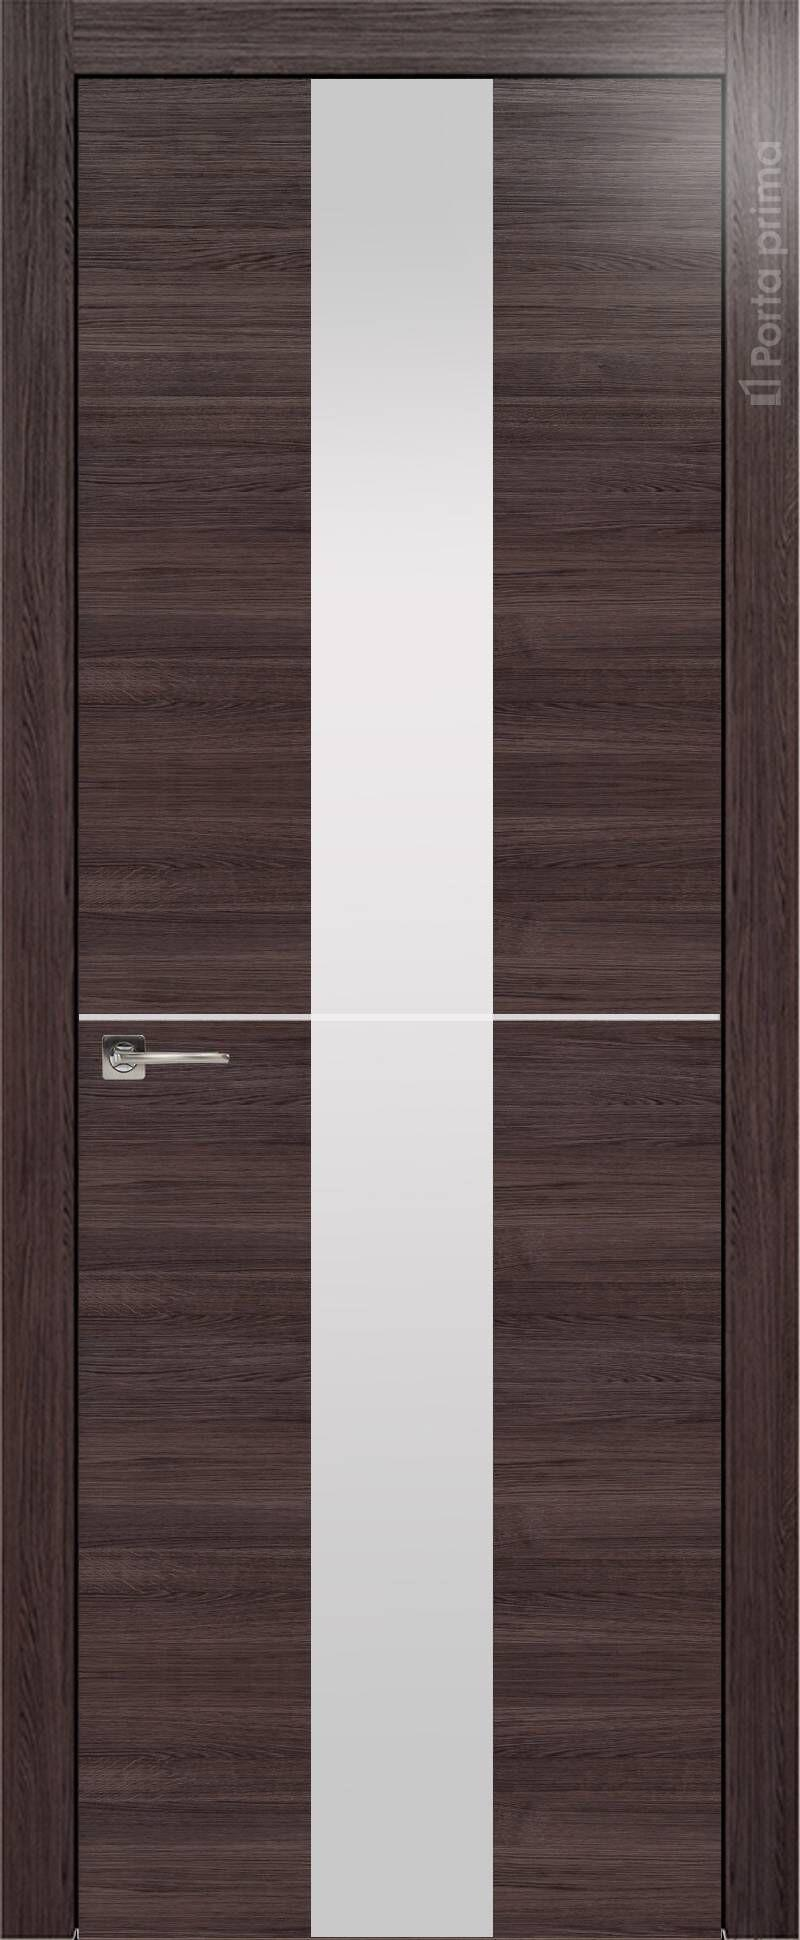 Tivoli Ж-3 цвет - Венге Нуар Со стеклом (ДО)